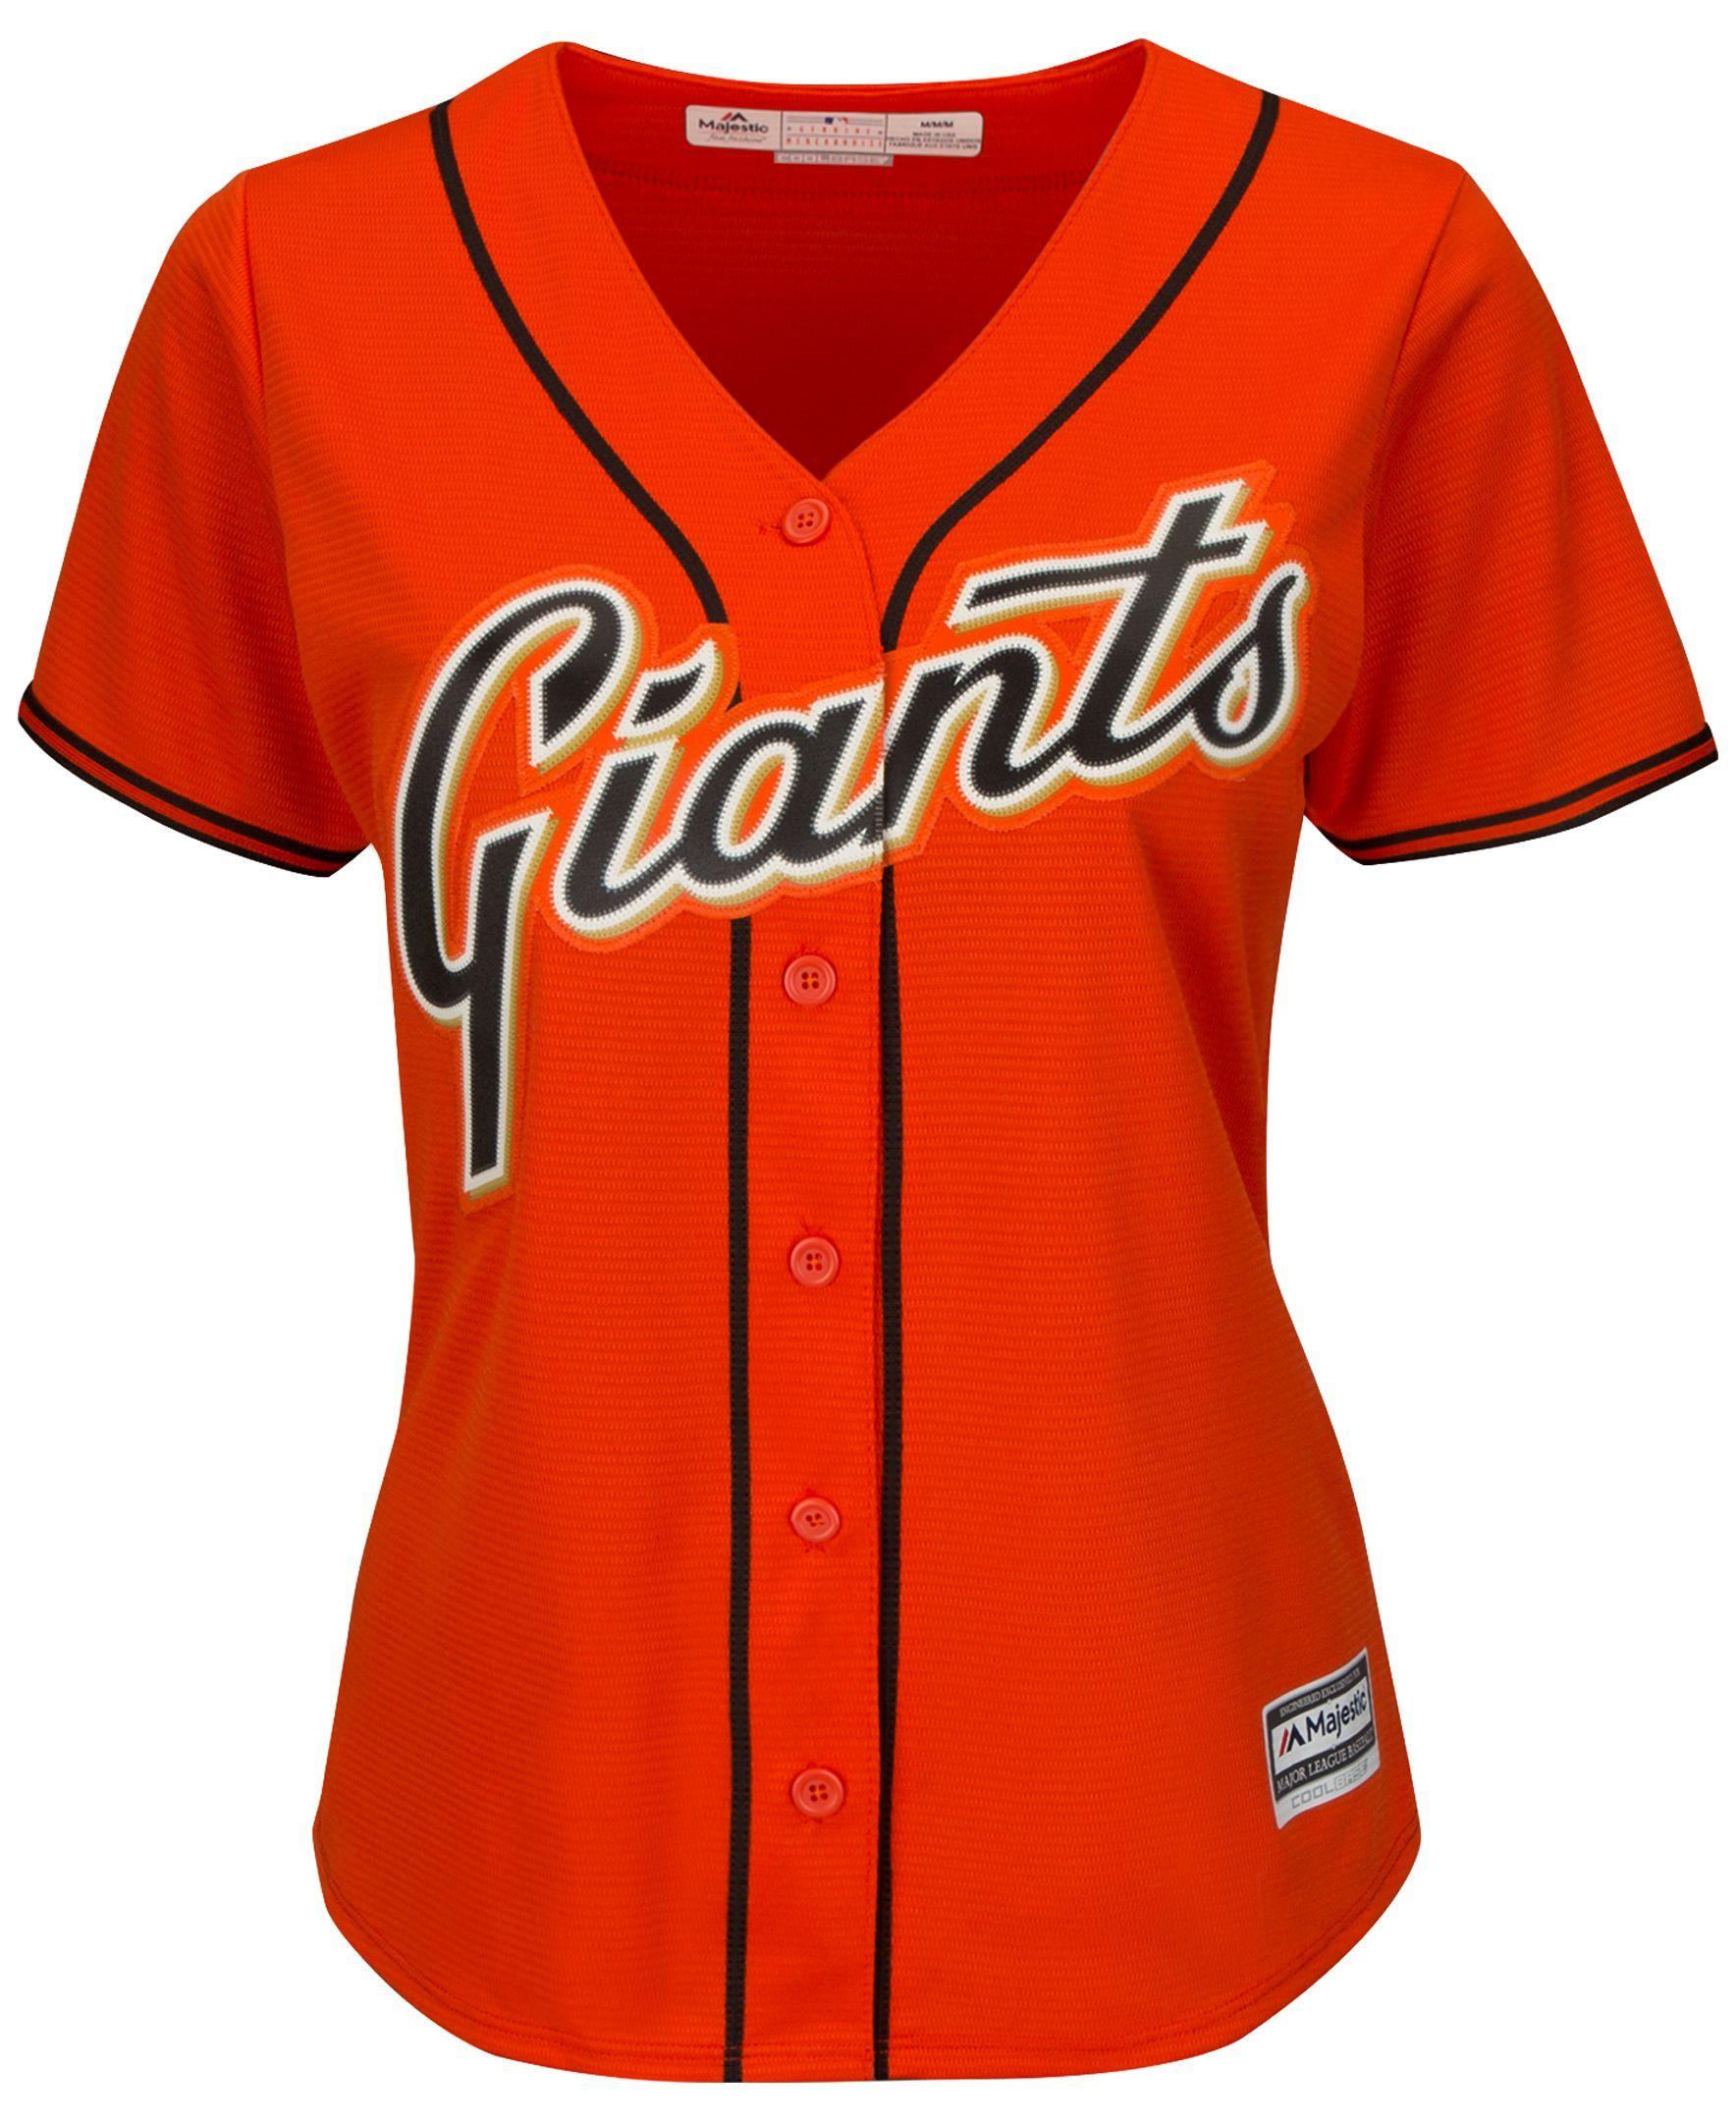 5c223c4b Majestic Women's San Francisco Giants Cool Base Jersey | Products ...